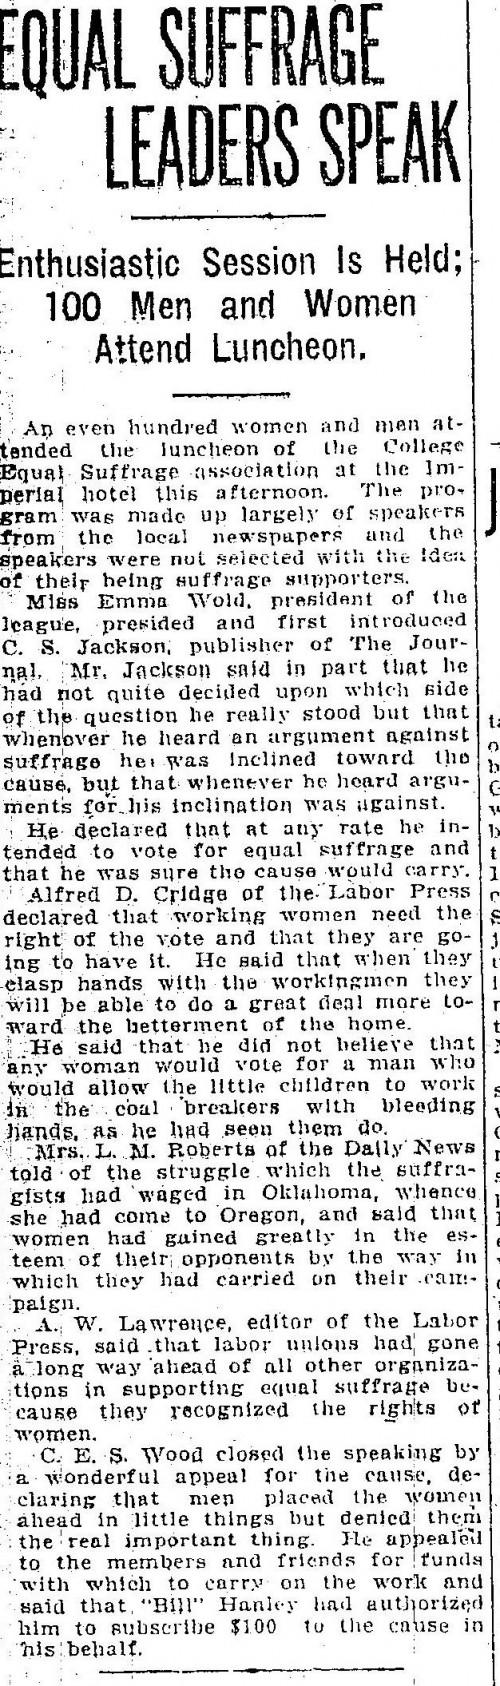 http://centuryofaction.org/images/uploads/OJ_7_29_1912_8_Equal_Suffrage_thumb.jpg